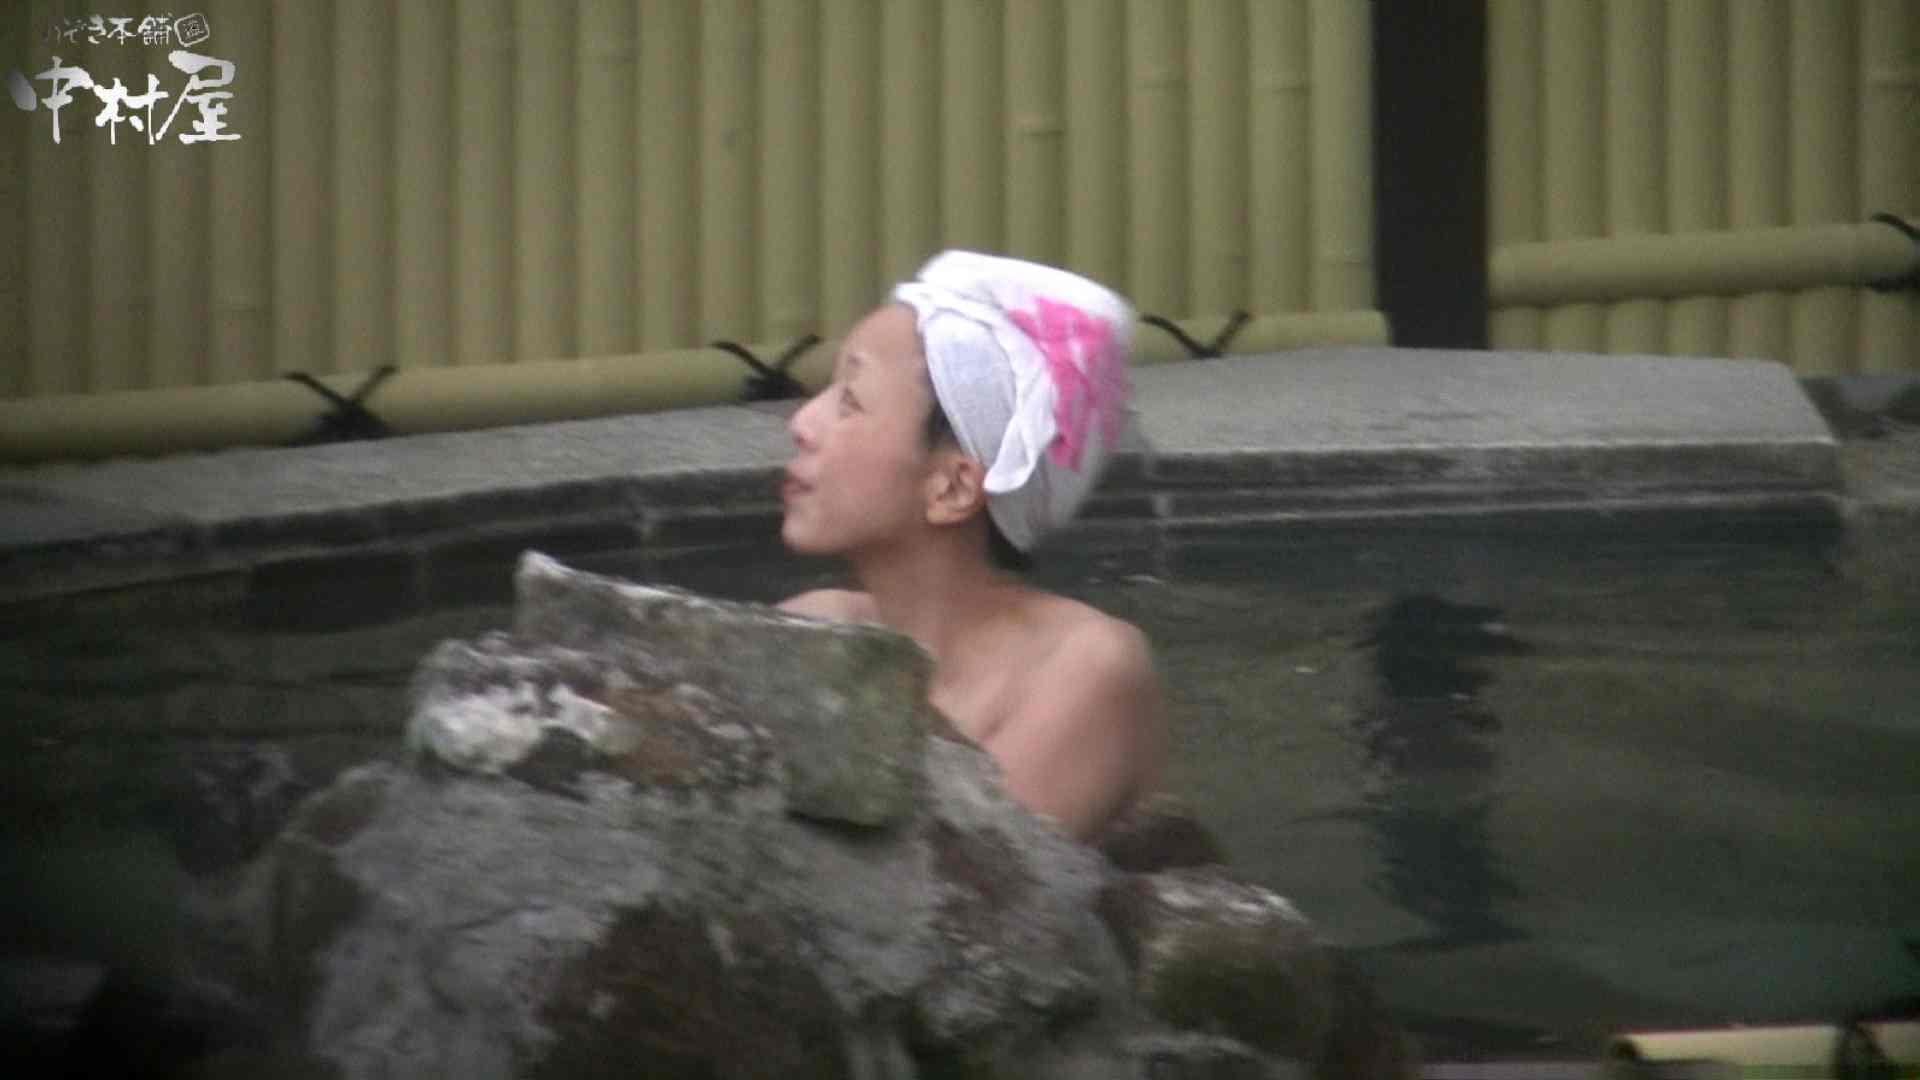 Aquaな露天風呂Vol.929 盗撮シリーズ   露天風呂編  94PIX 27